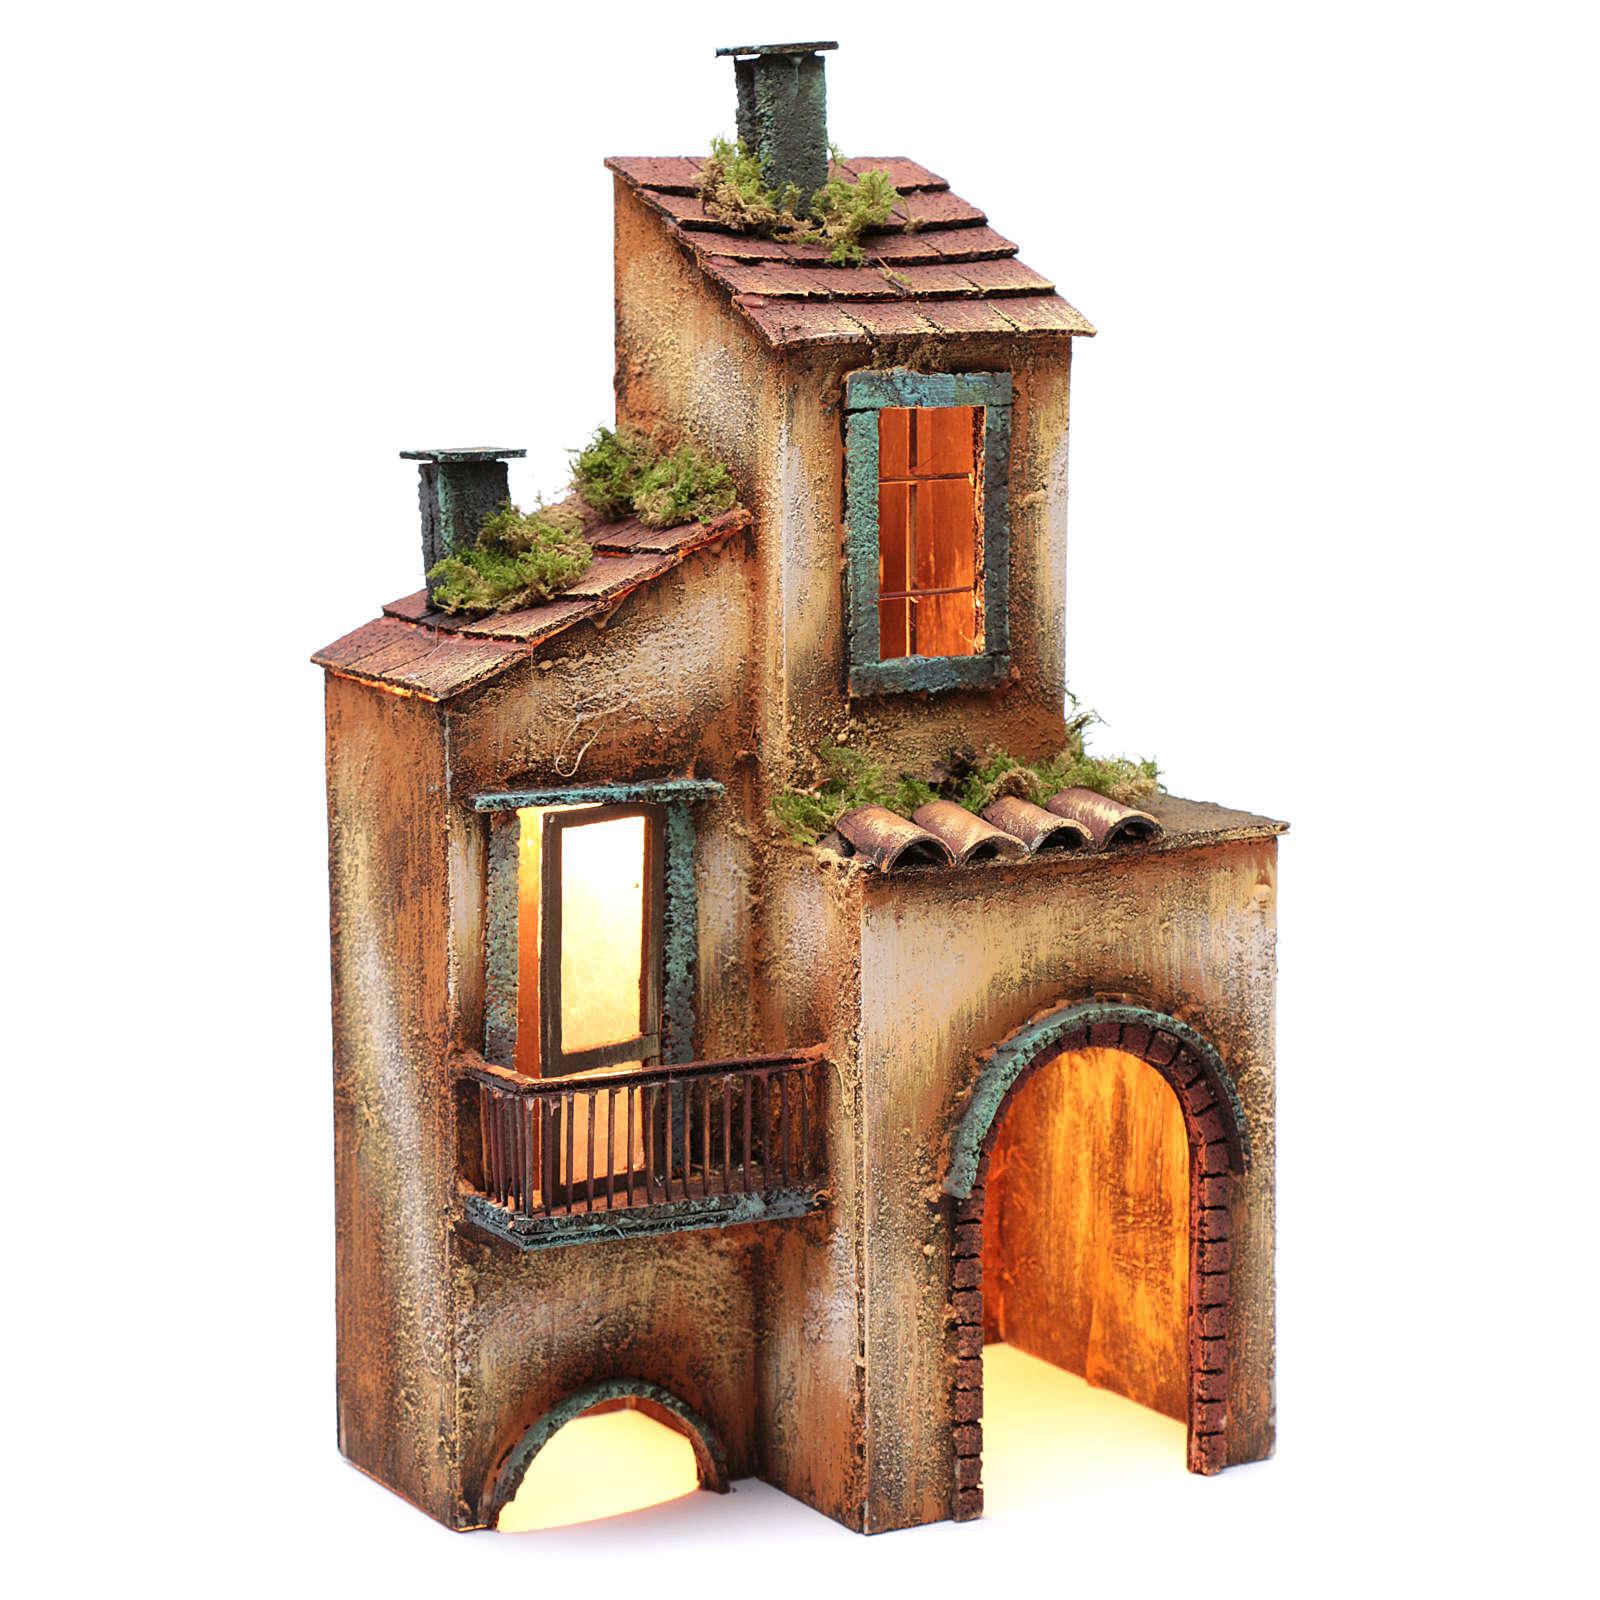 Wooden house for Neapolitan nativity scene 41X25X16 cm 4